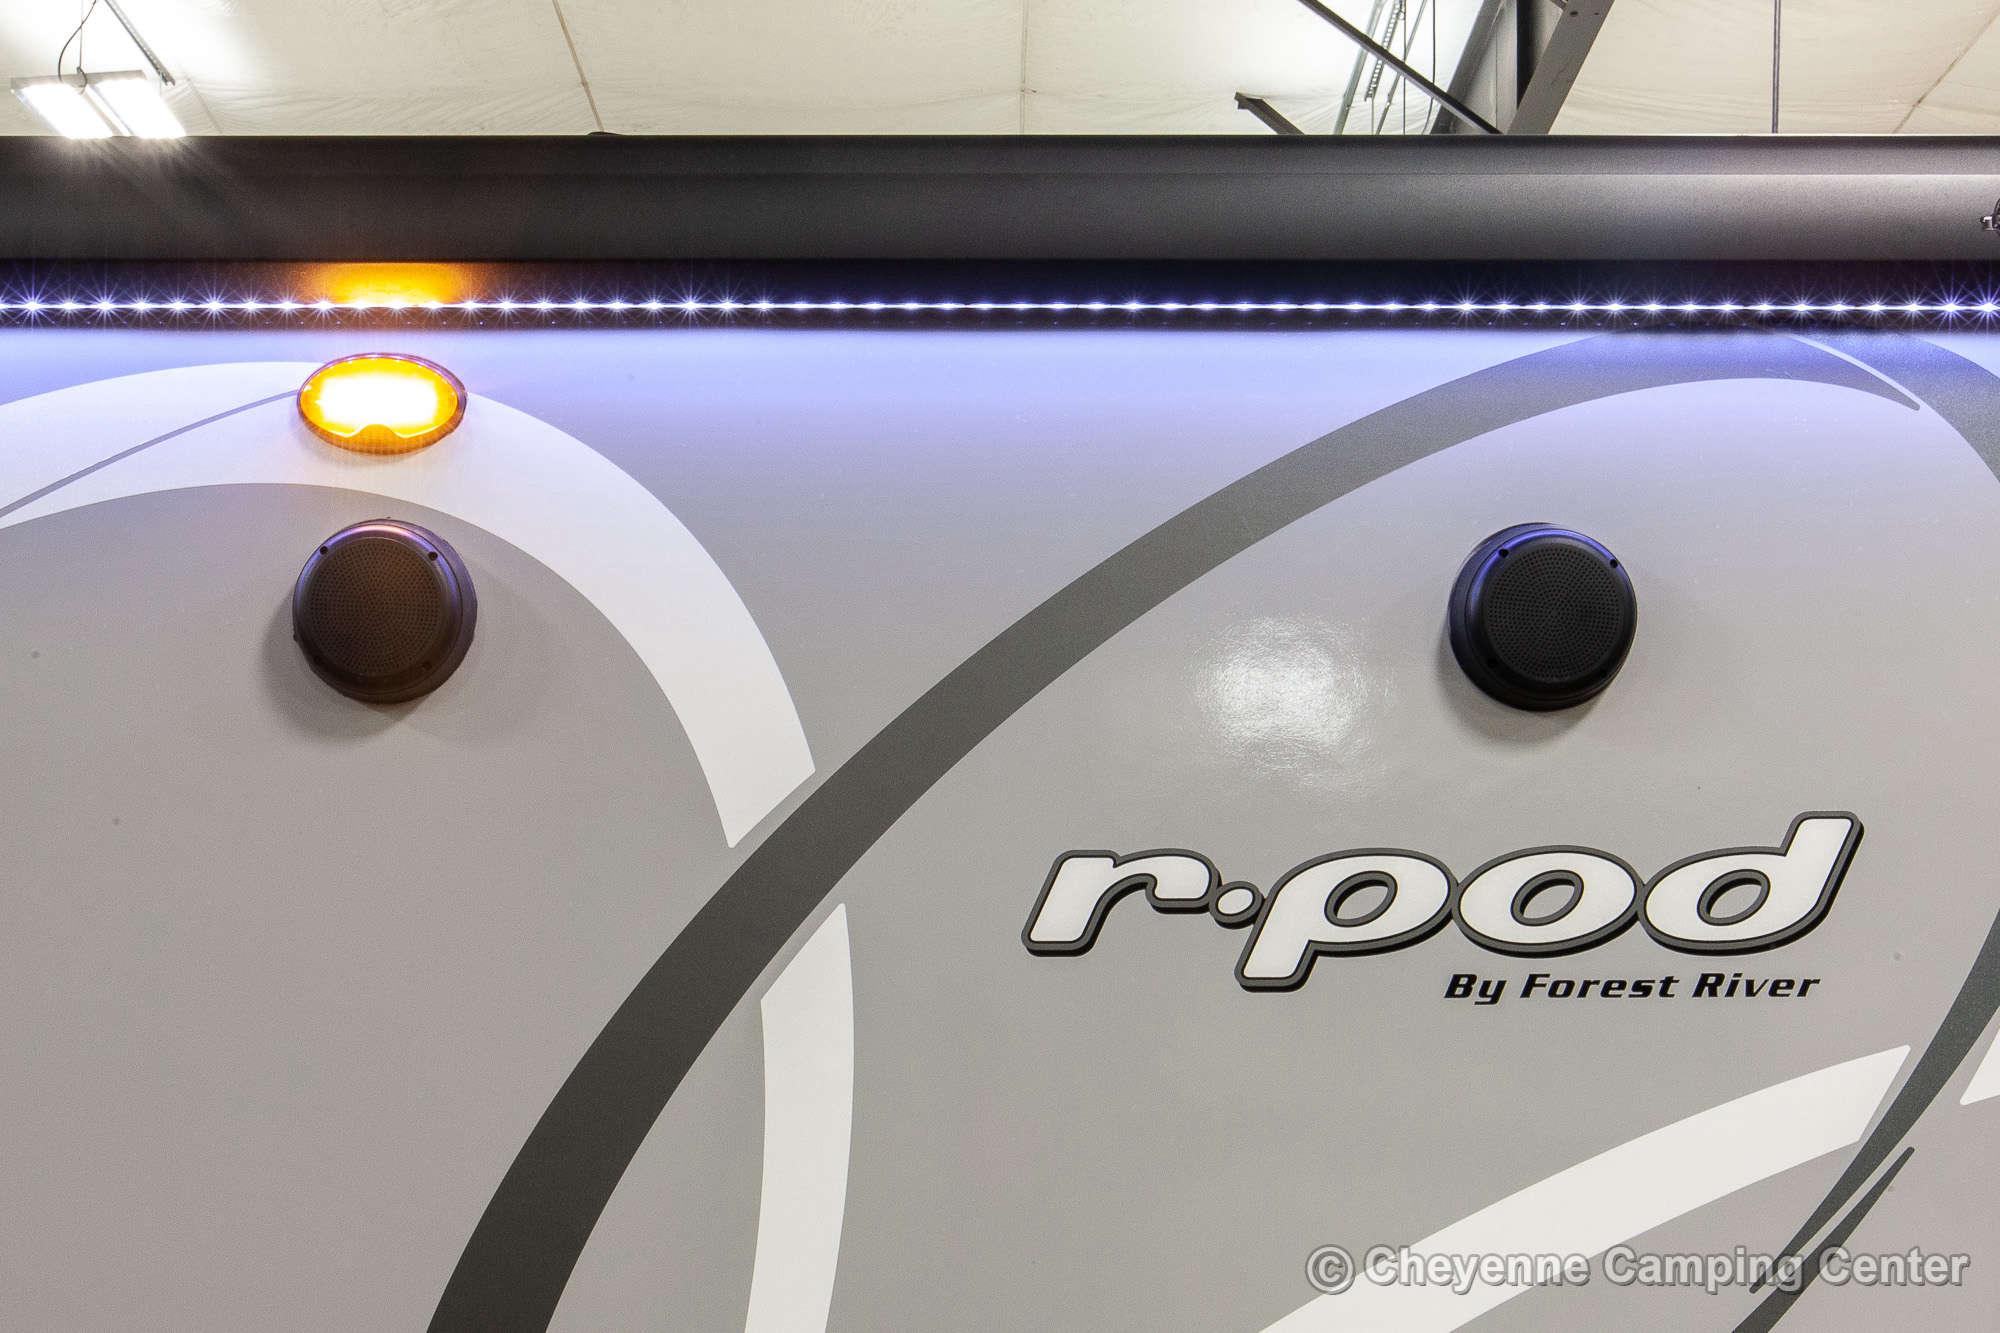 2019 Forest River R-POD RP-191 Travel Trailer Exterior Image